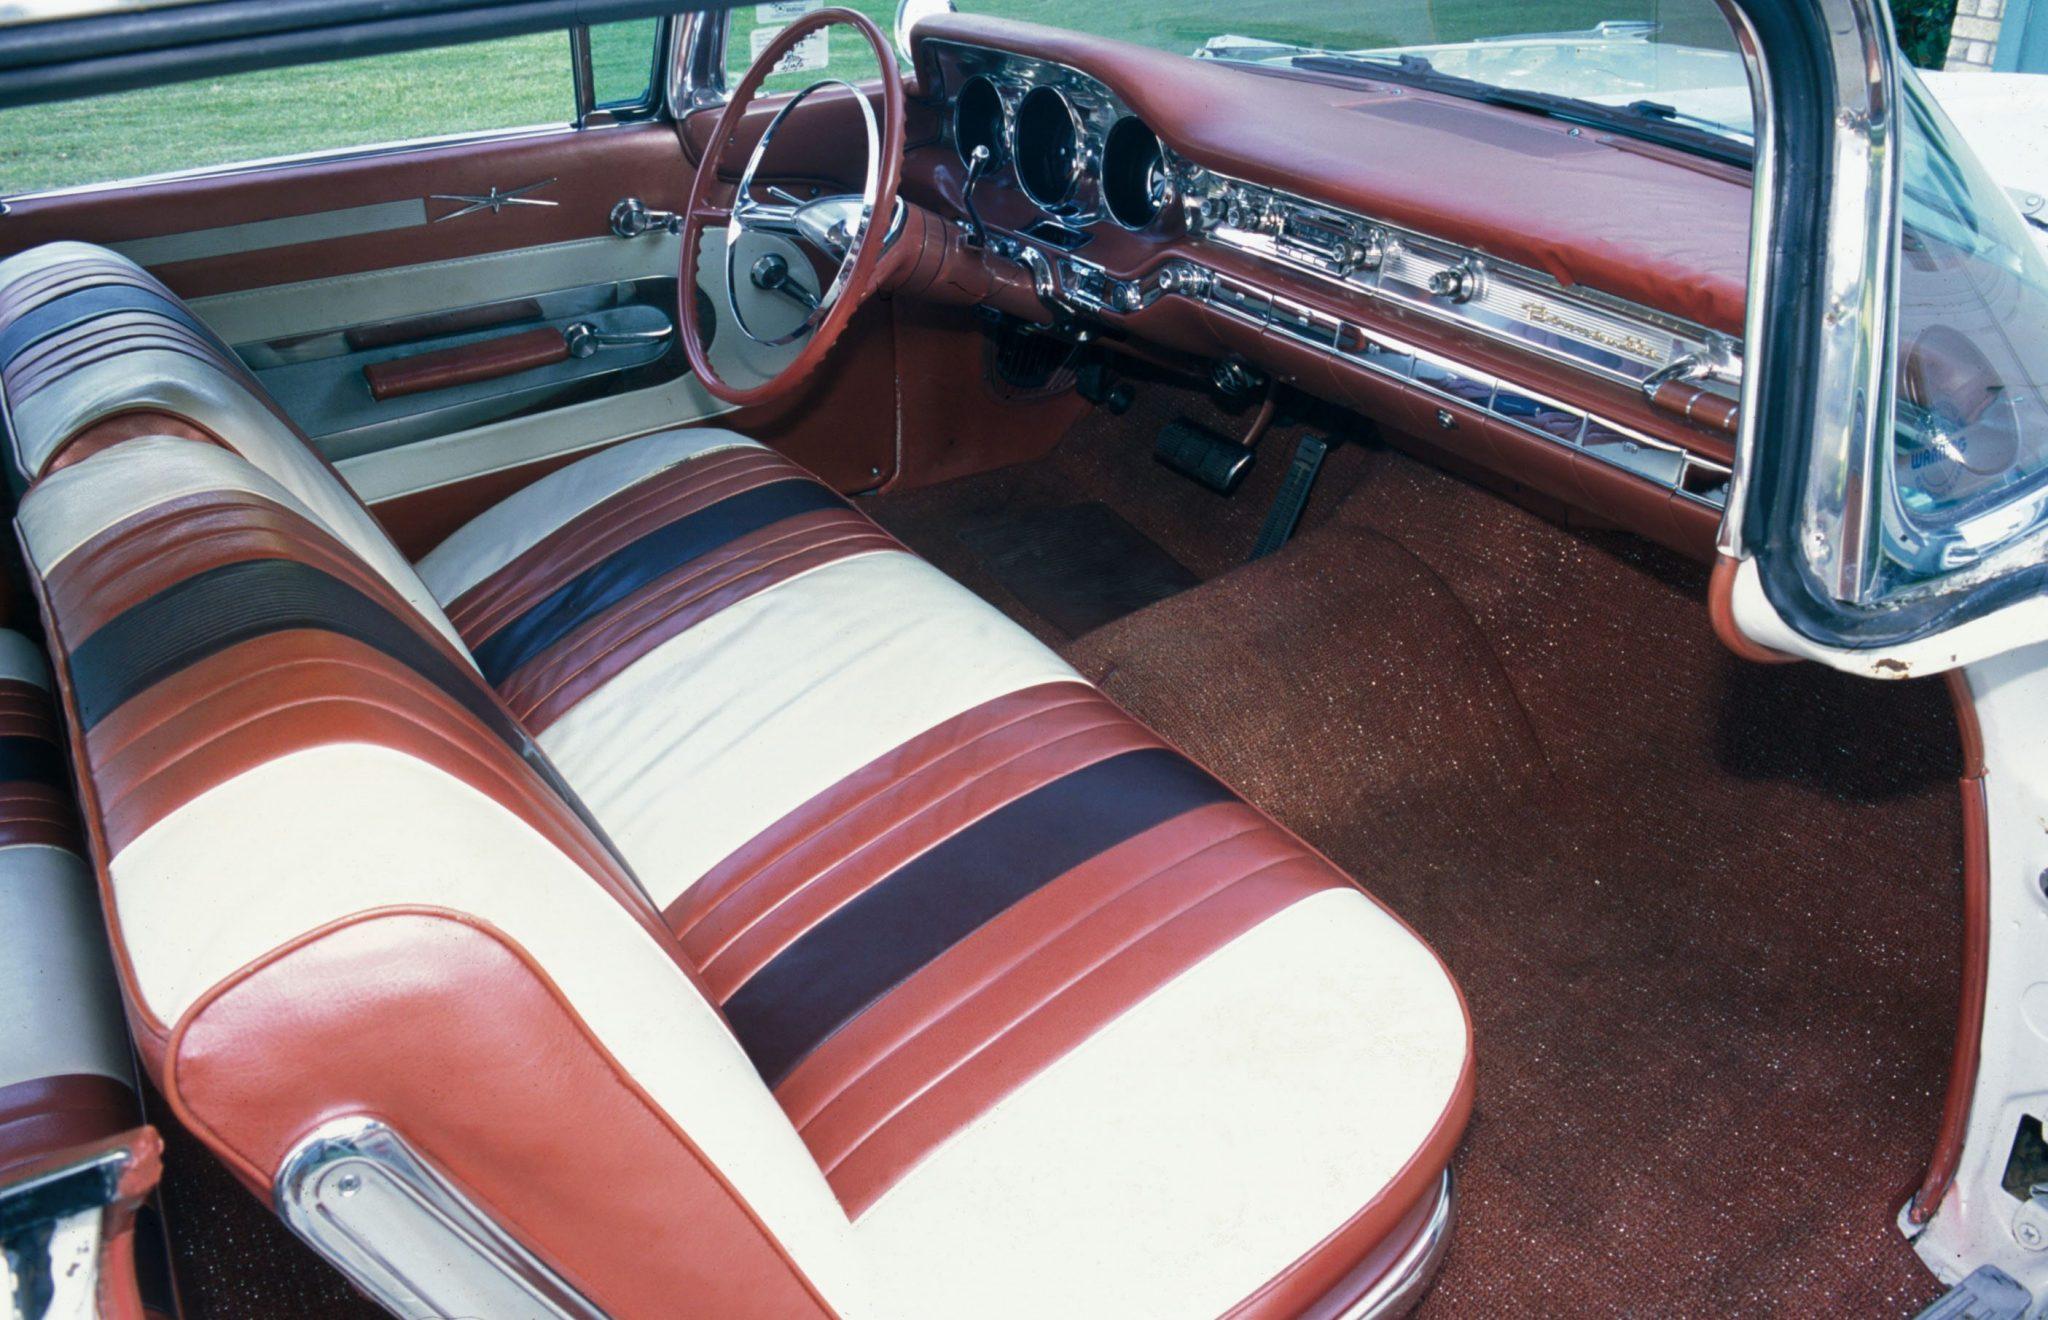 1959 Pontiac Bonneville Tri-Tone Interior